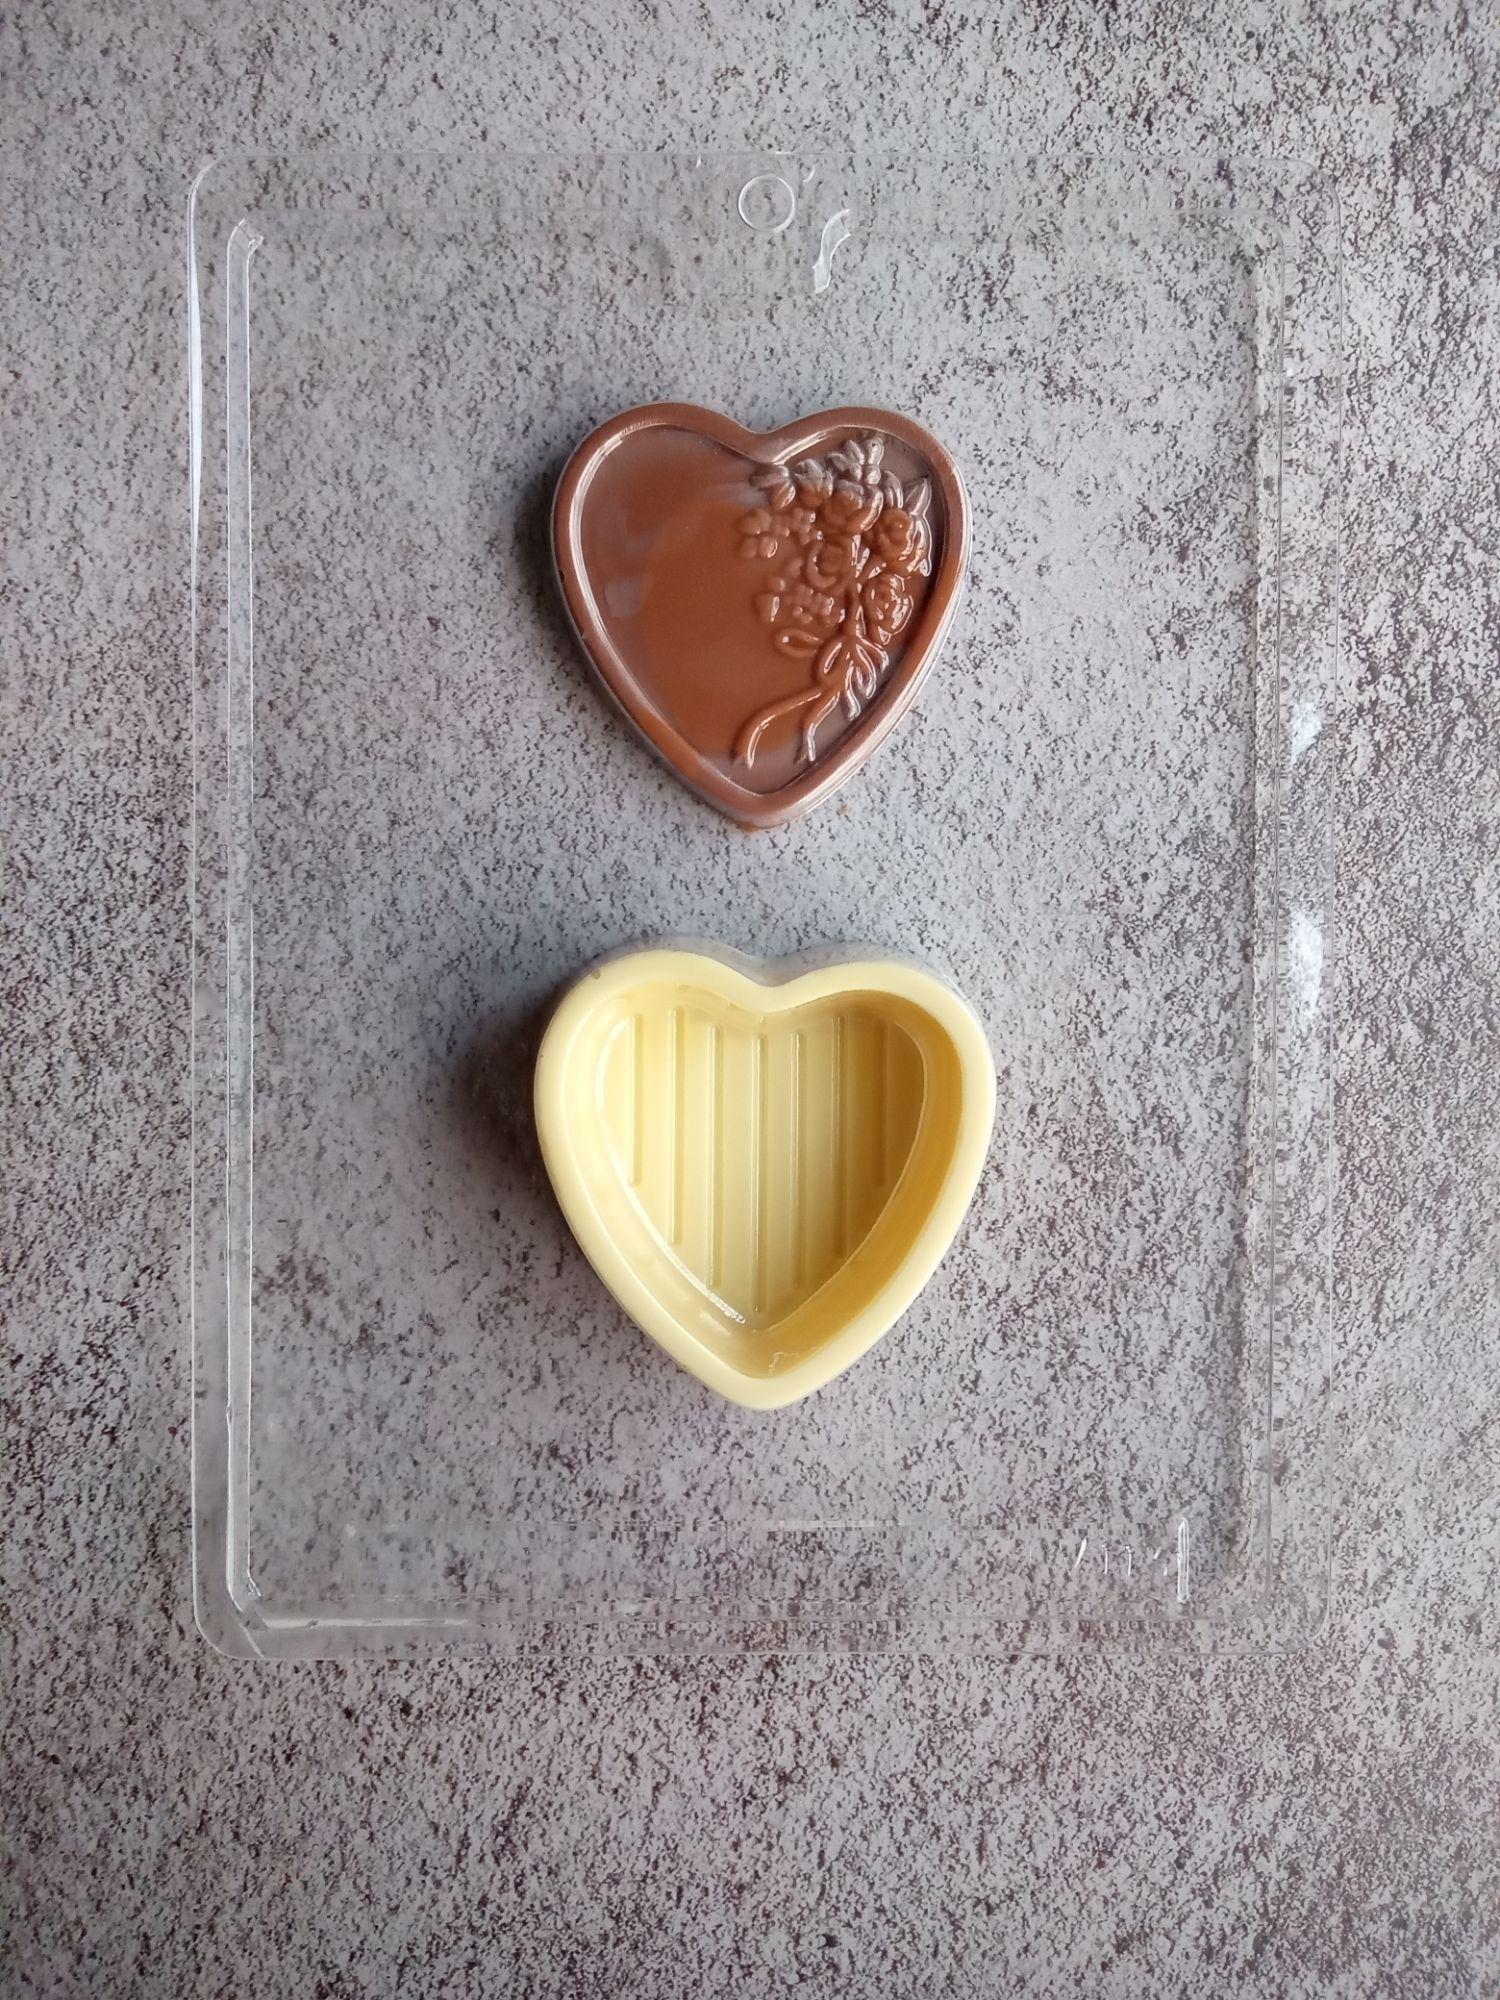 Heart Chocolate Pour Box Mould